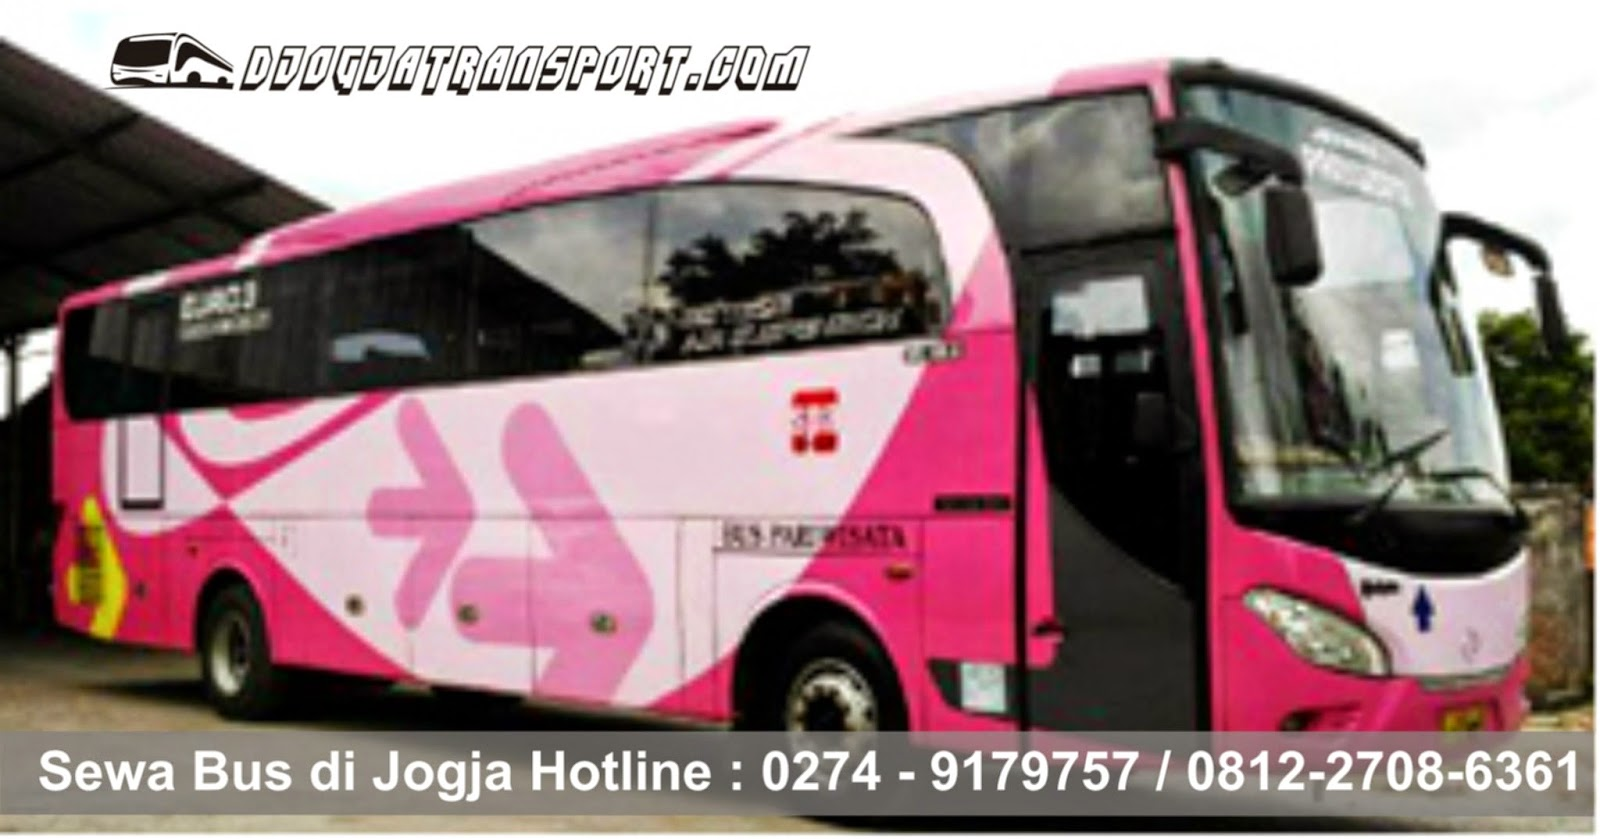 sewa big bus wisata di jogja